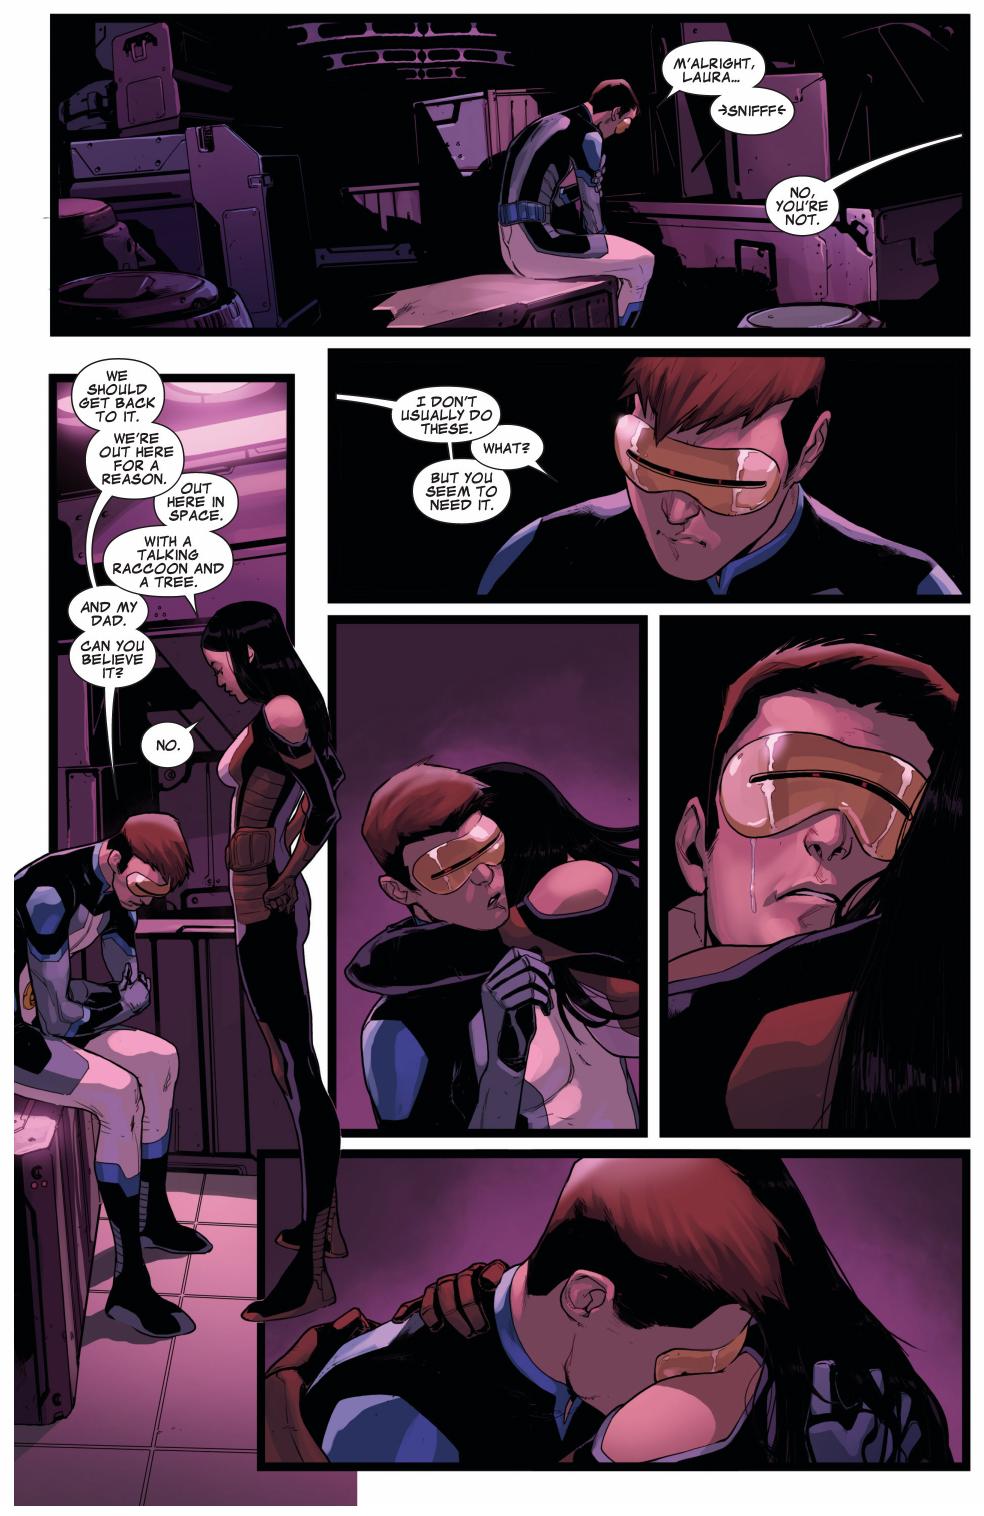 x-23 hugs original 5 cyclops